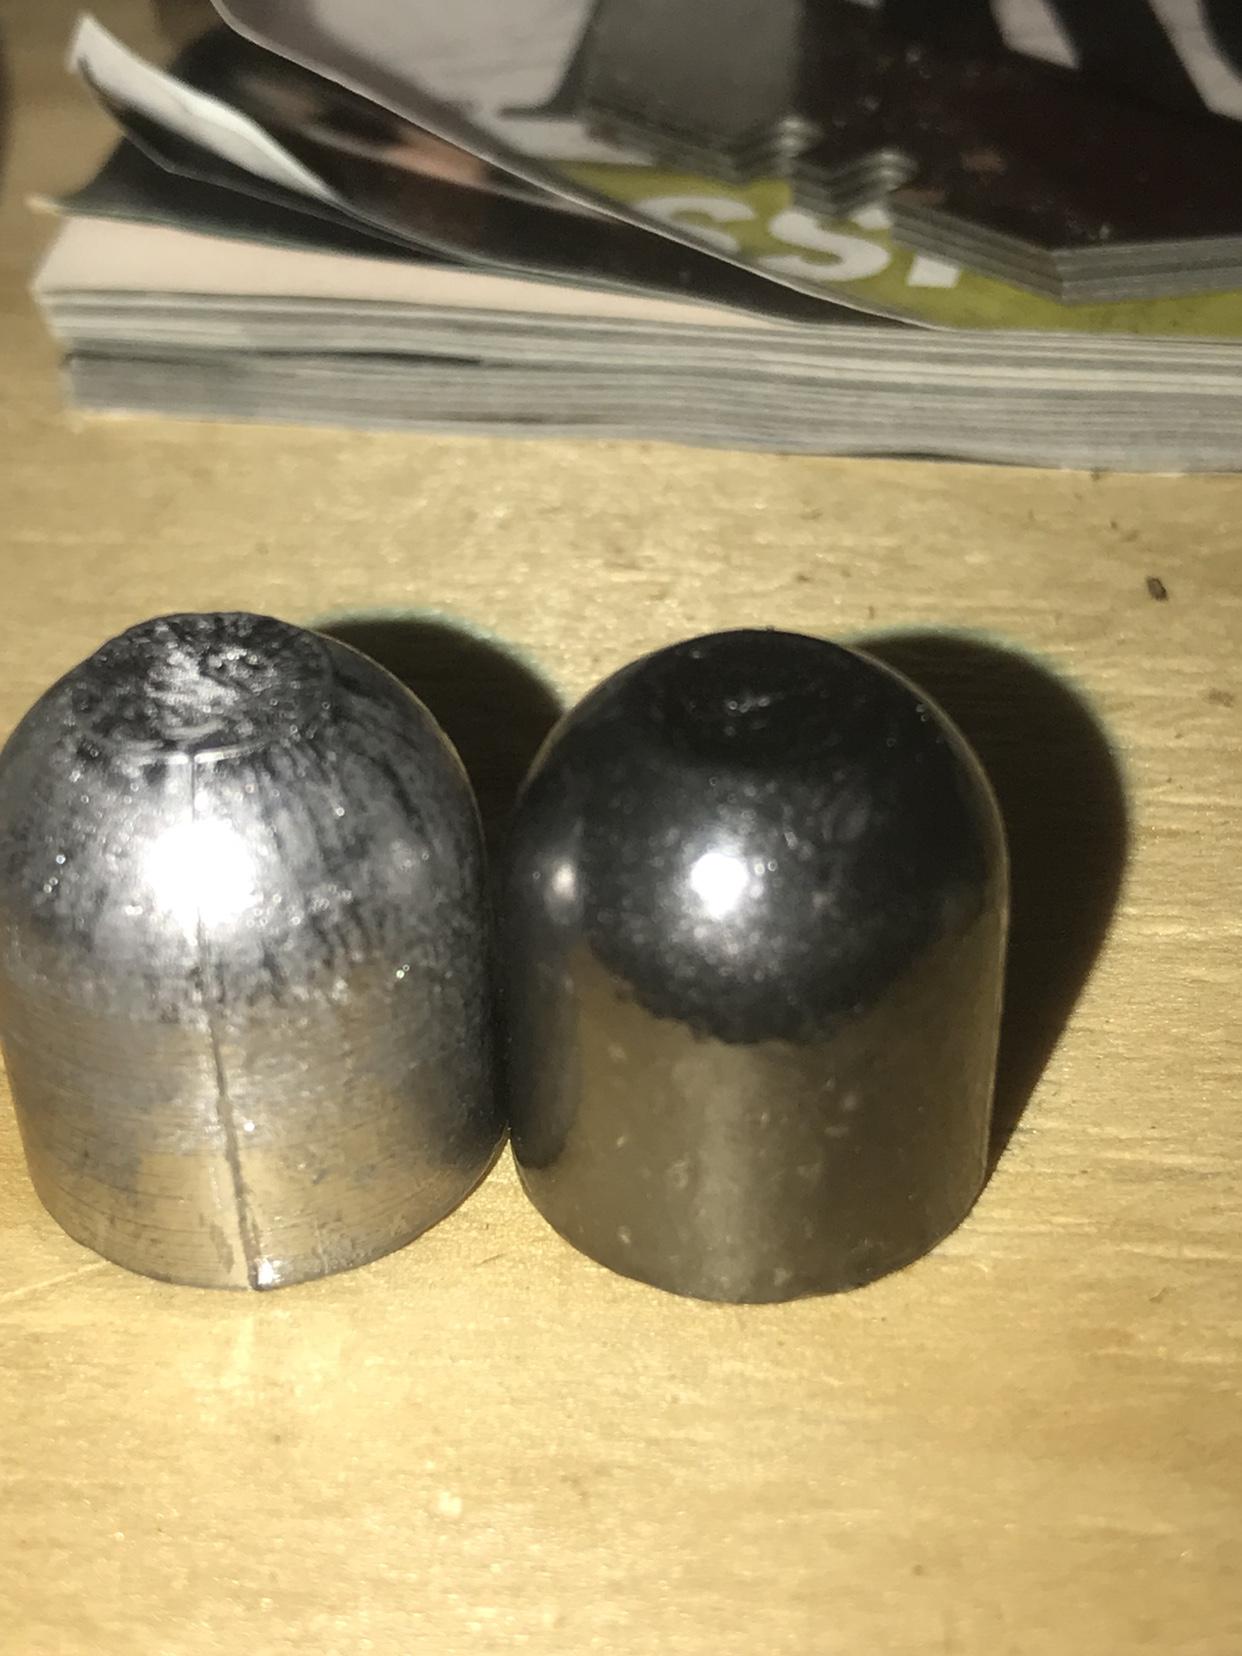 Tumbling round balls, buckshot, and slugs